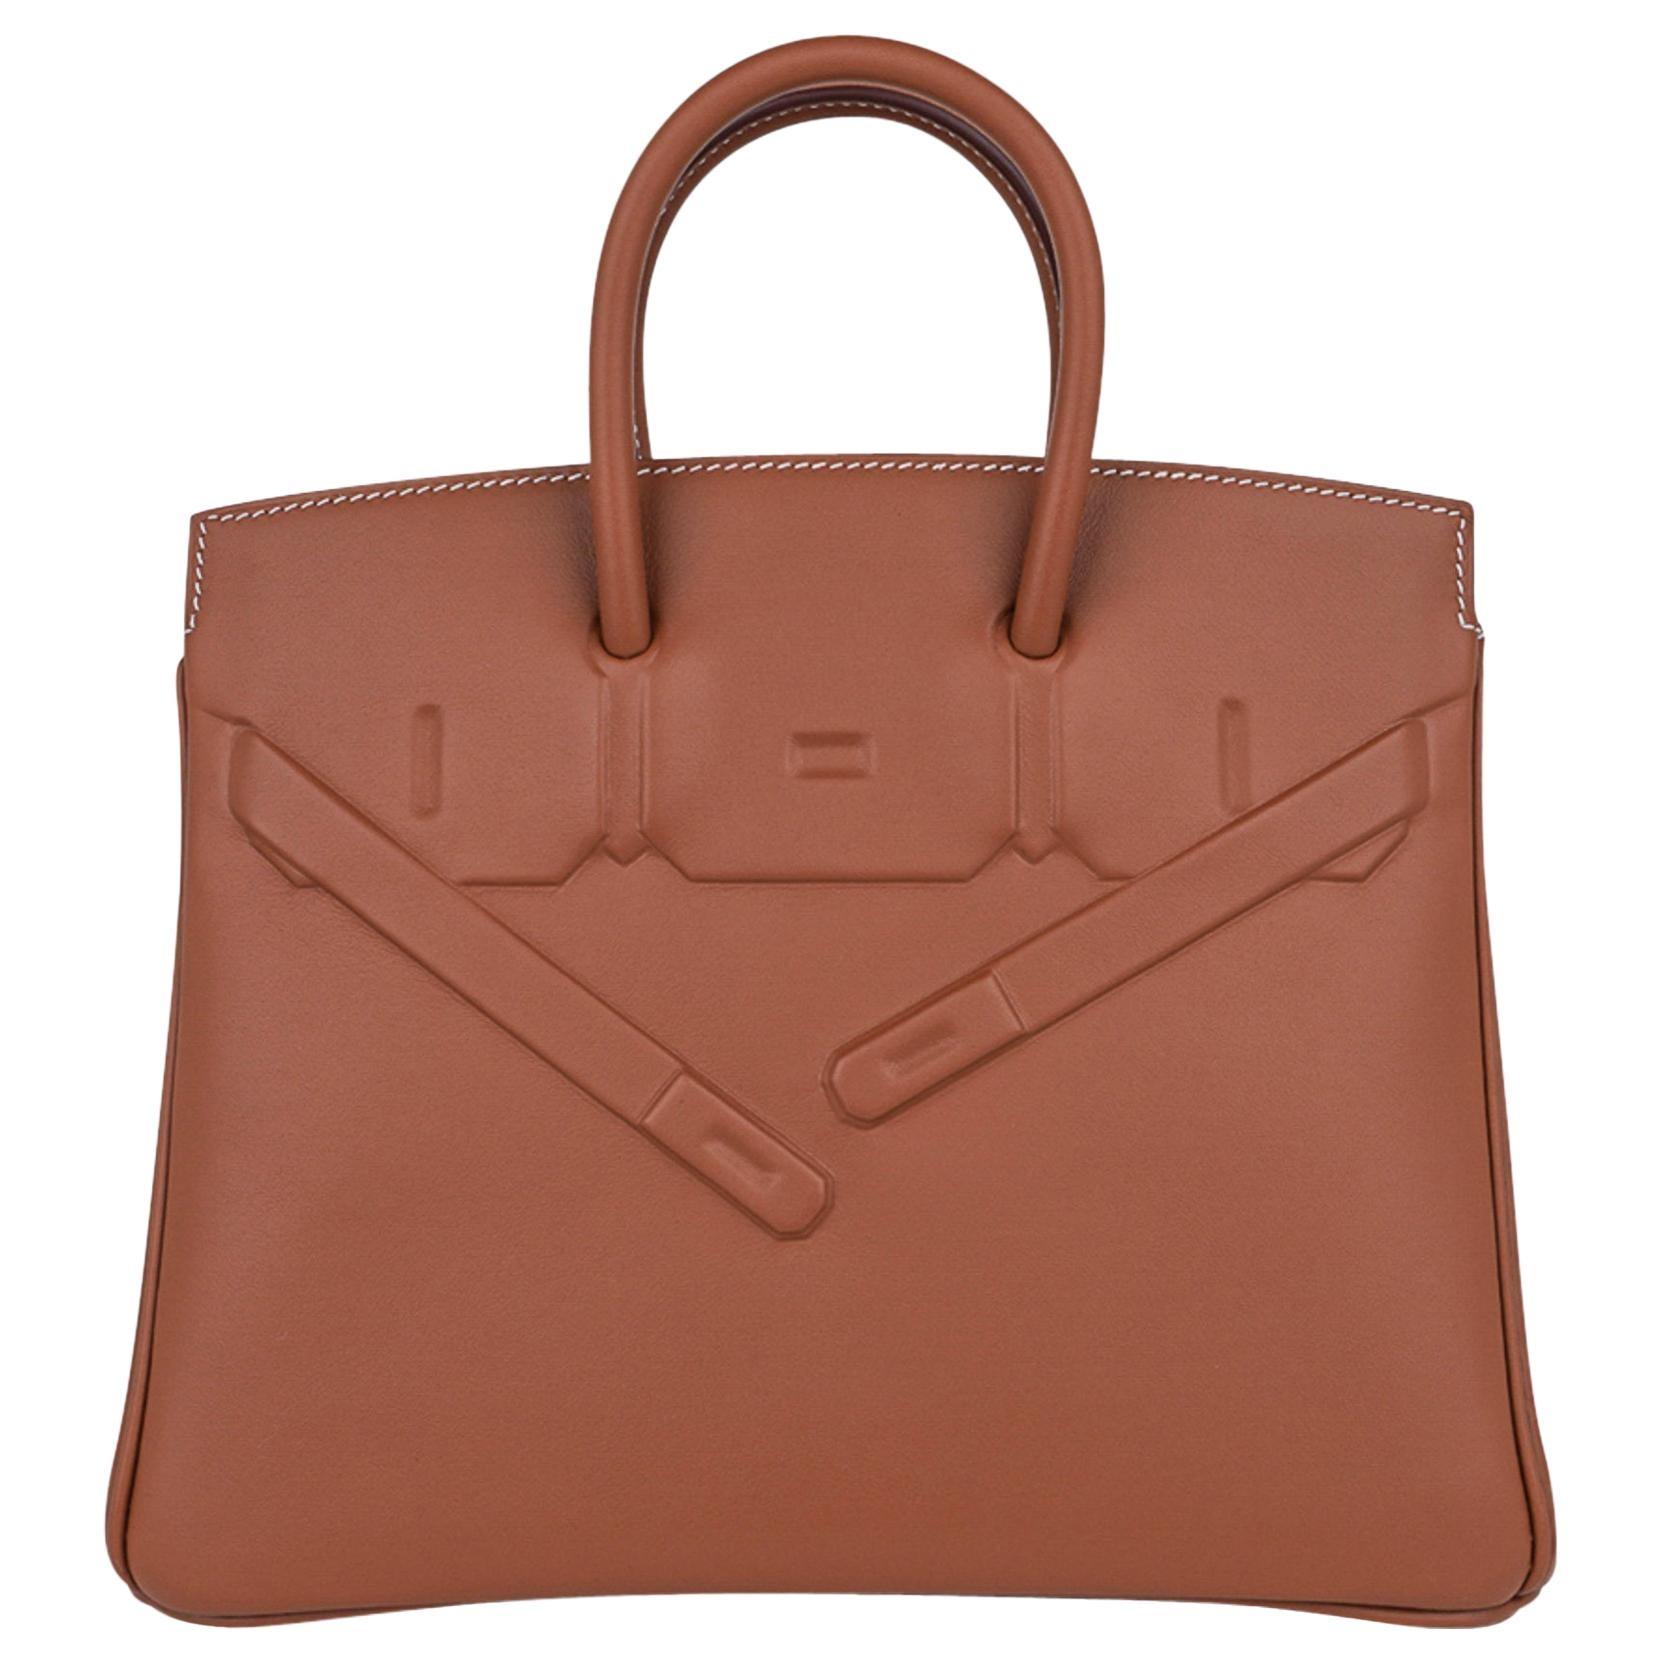 Hermes Shadow Birkin 25 Bag Gold Evercalf Limited Edition